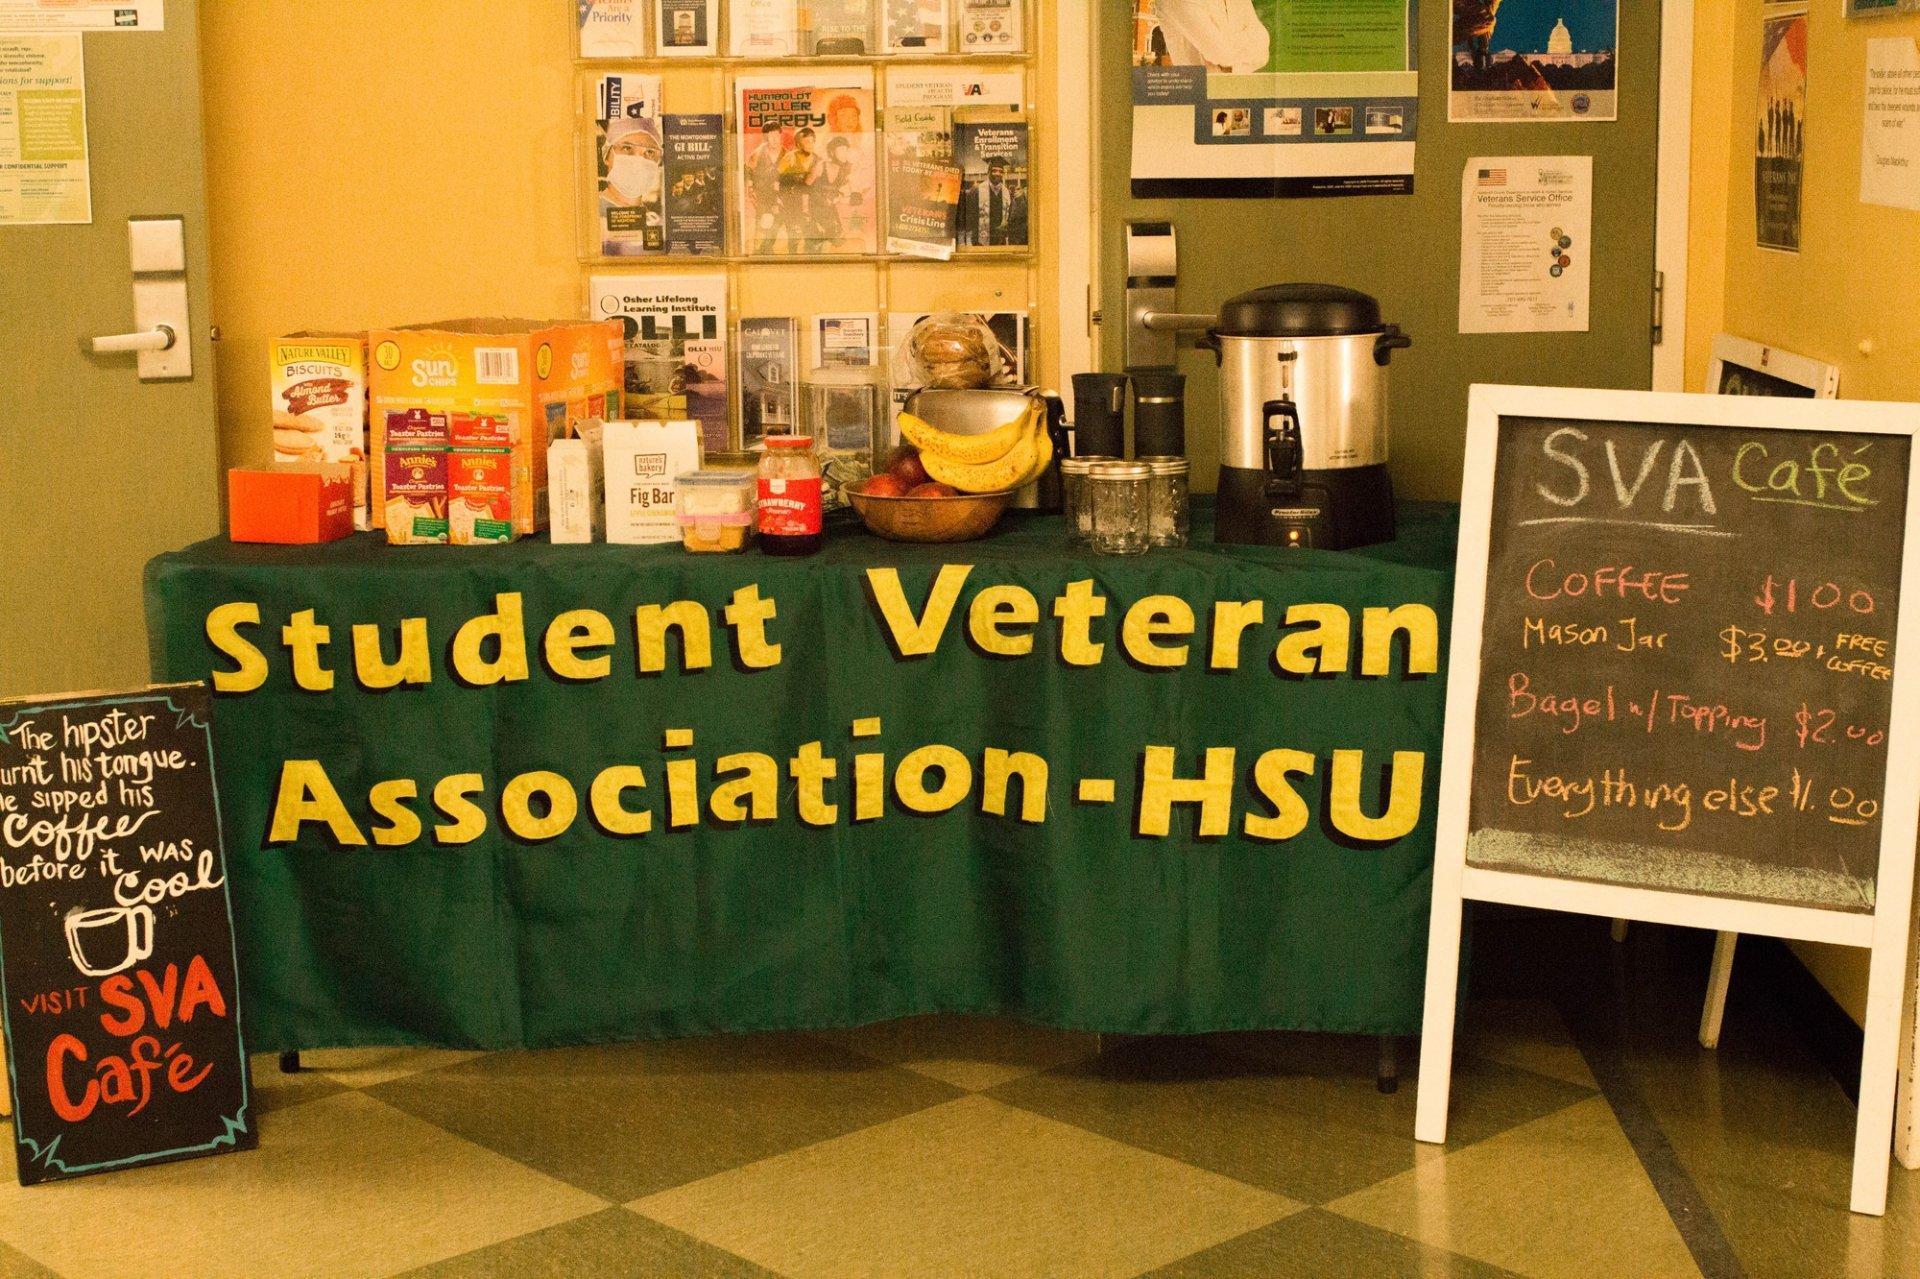 The Student Veterans Association Cafe outside of the Veterans office. Photo credit: Lauren Shea